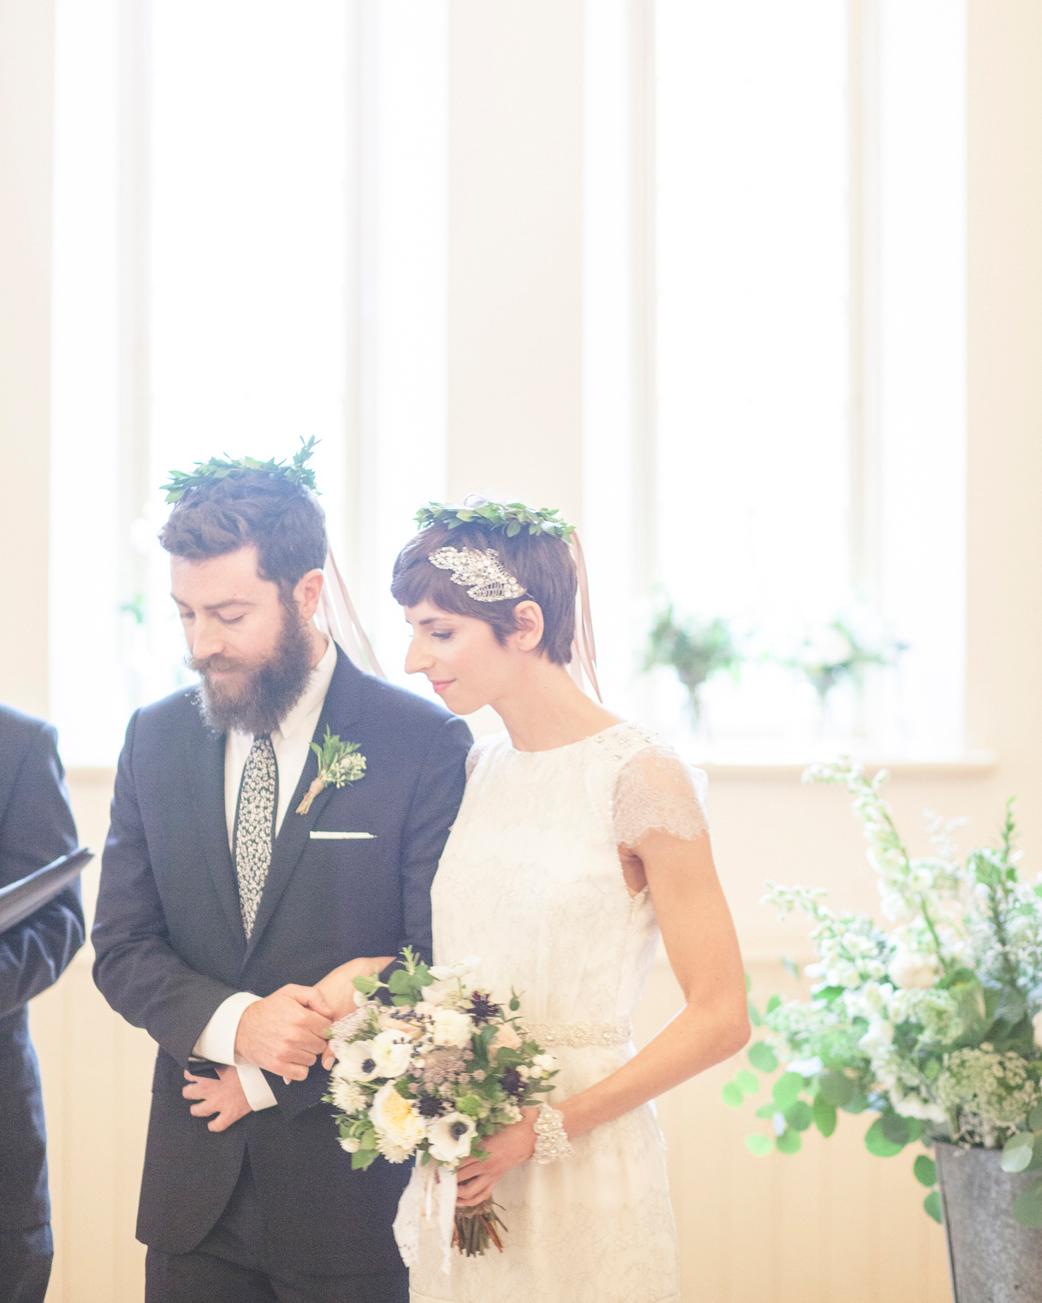 trish-alan-wedding-ceremony2-053-s111348-0714.jpg